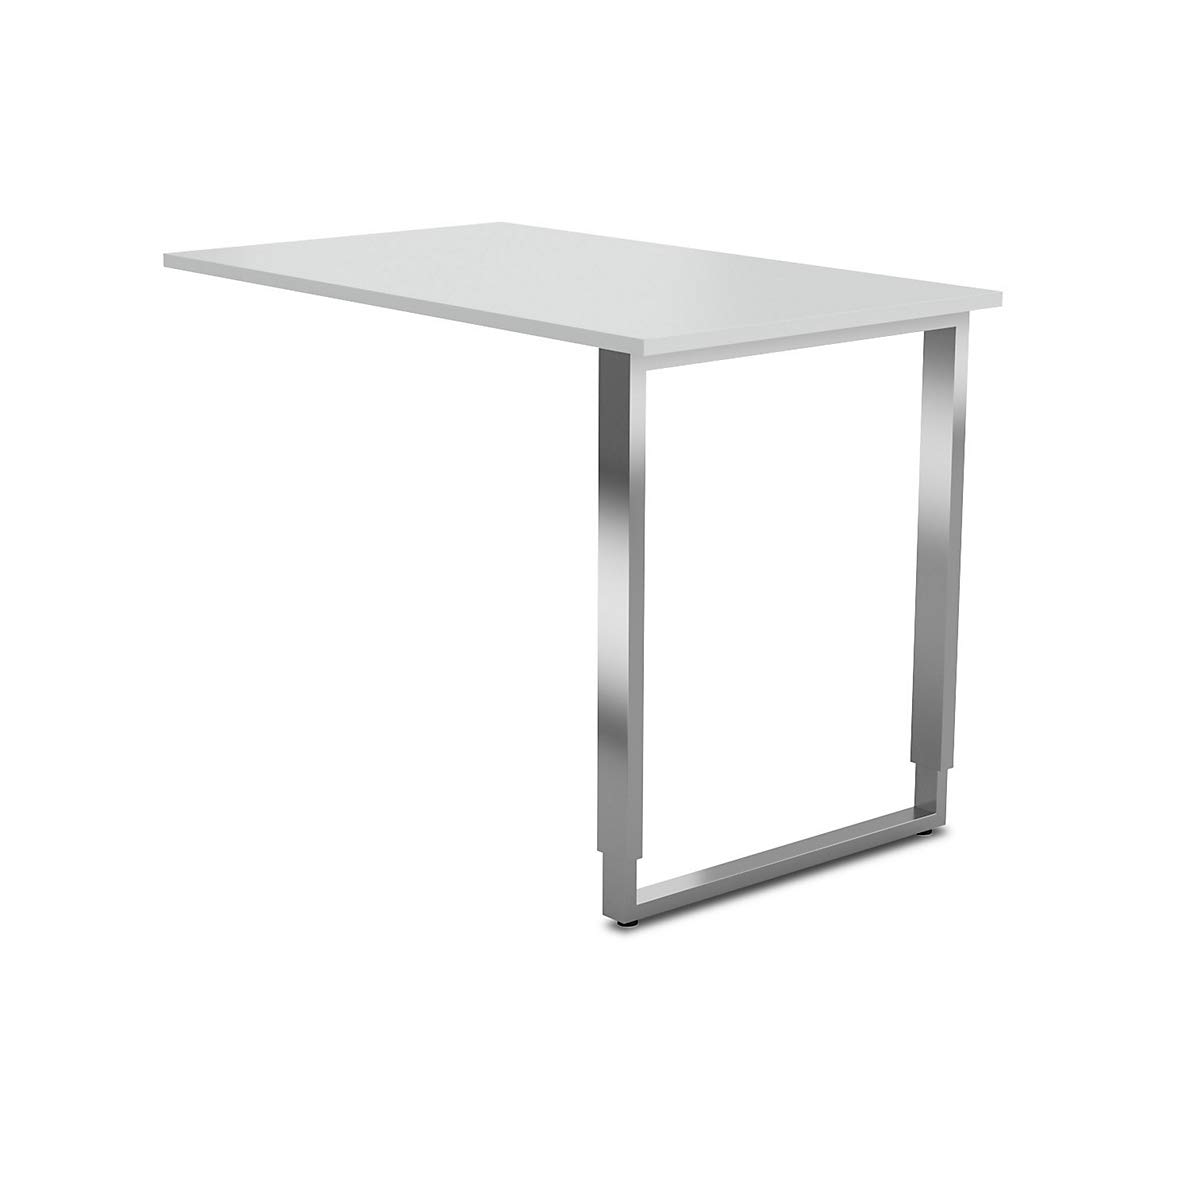 kerkmann - kerkmann - Mesa modular AVETO (1000 mm), color blanco ...